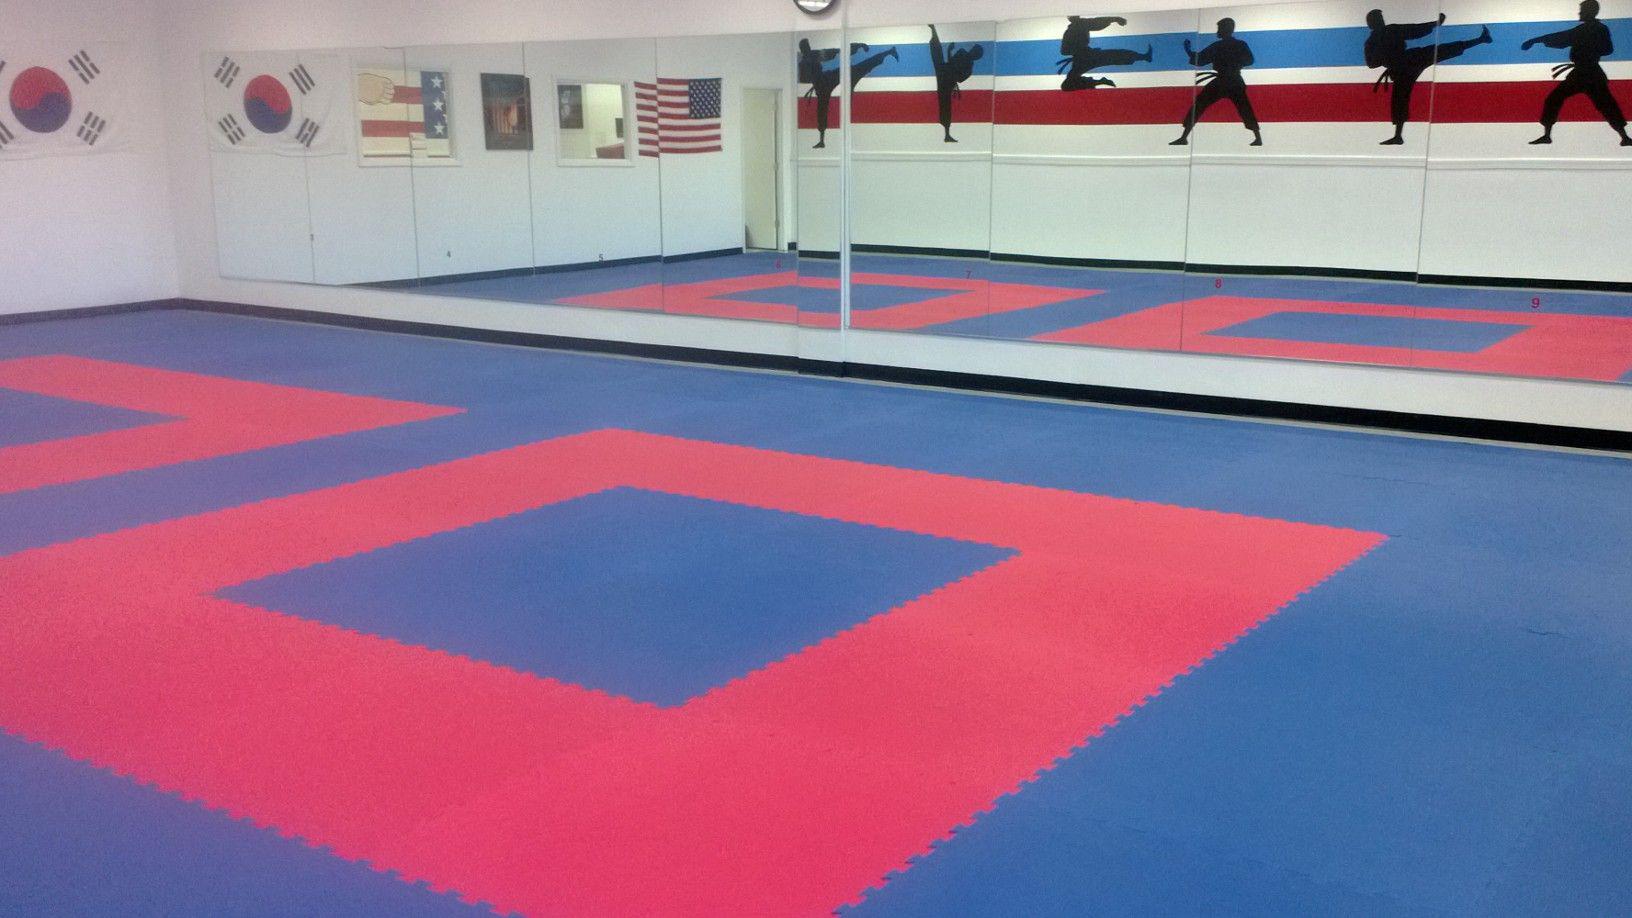 Martial Arts Karate Mat Premium 1 Inch In 2020 Karate Mats Martial Arts Mats Dojo Decor